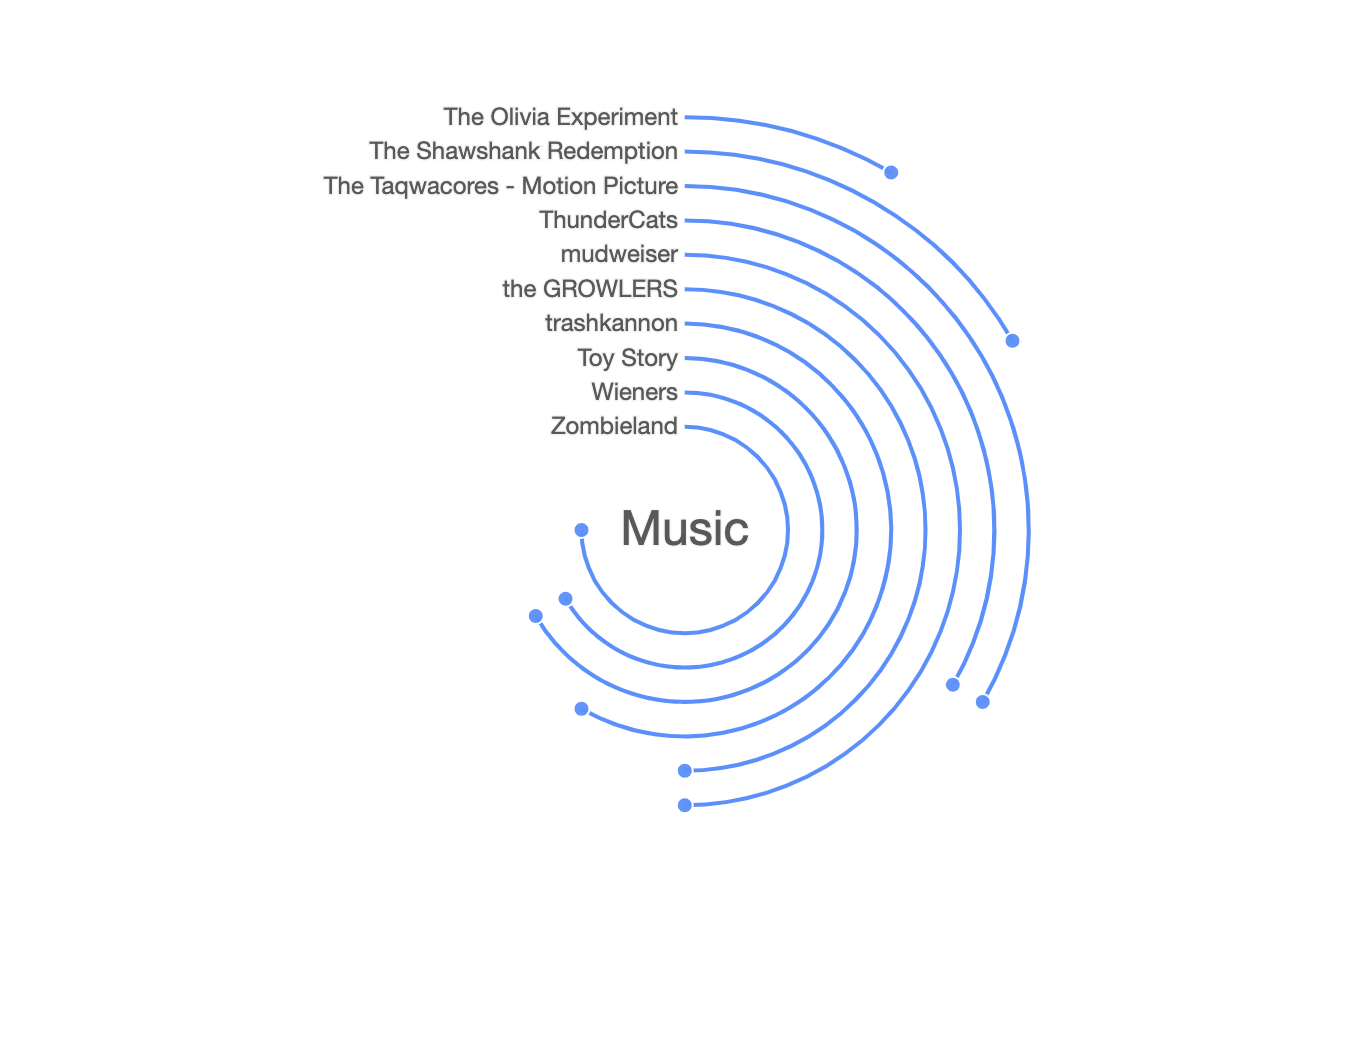 Radial Bar Chart